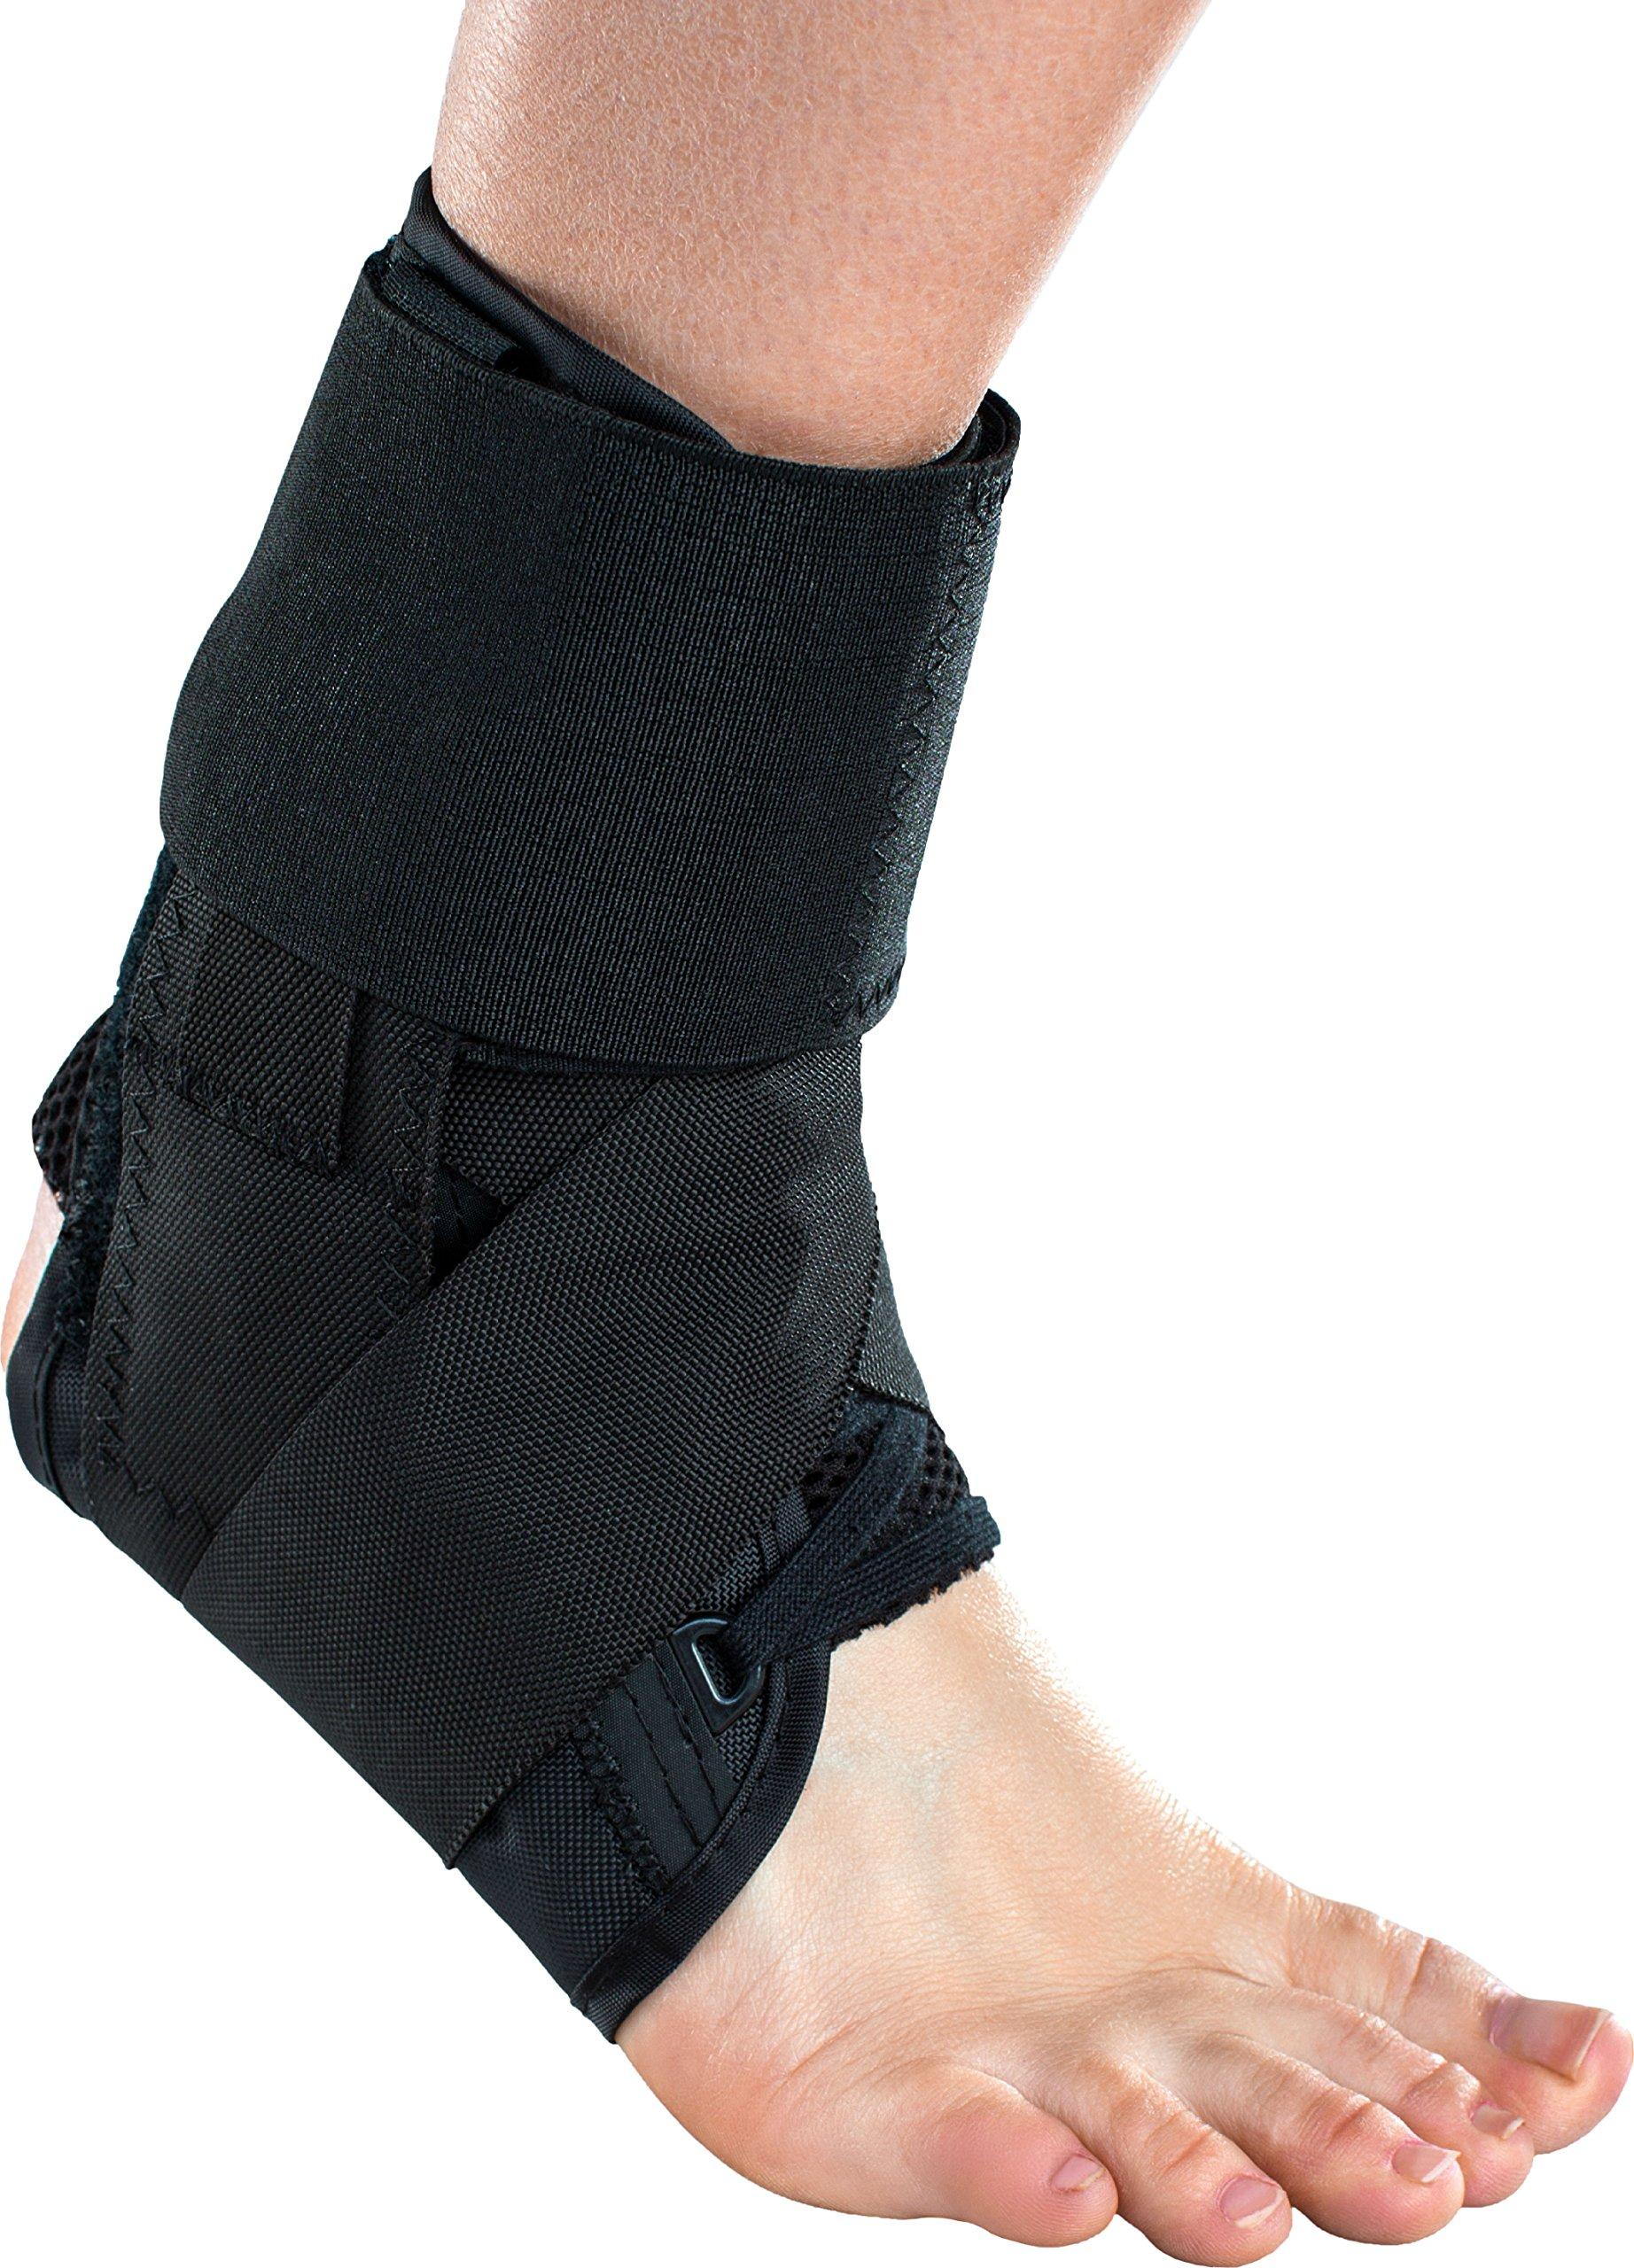 DonJoy Stabilizing Speed Pro Ankle Support Brace, XX-Large by DonJoy